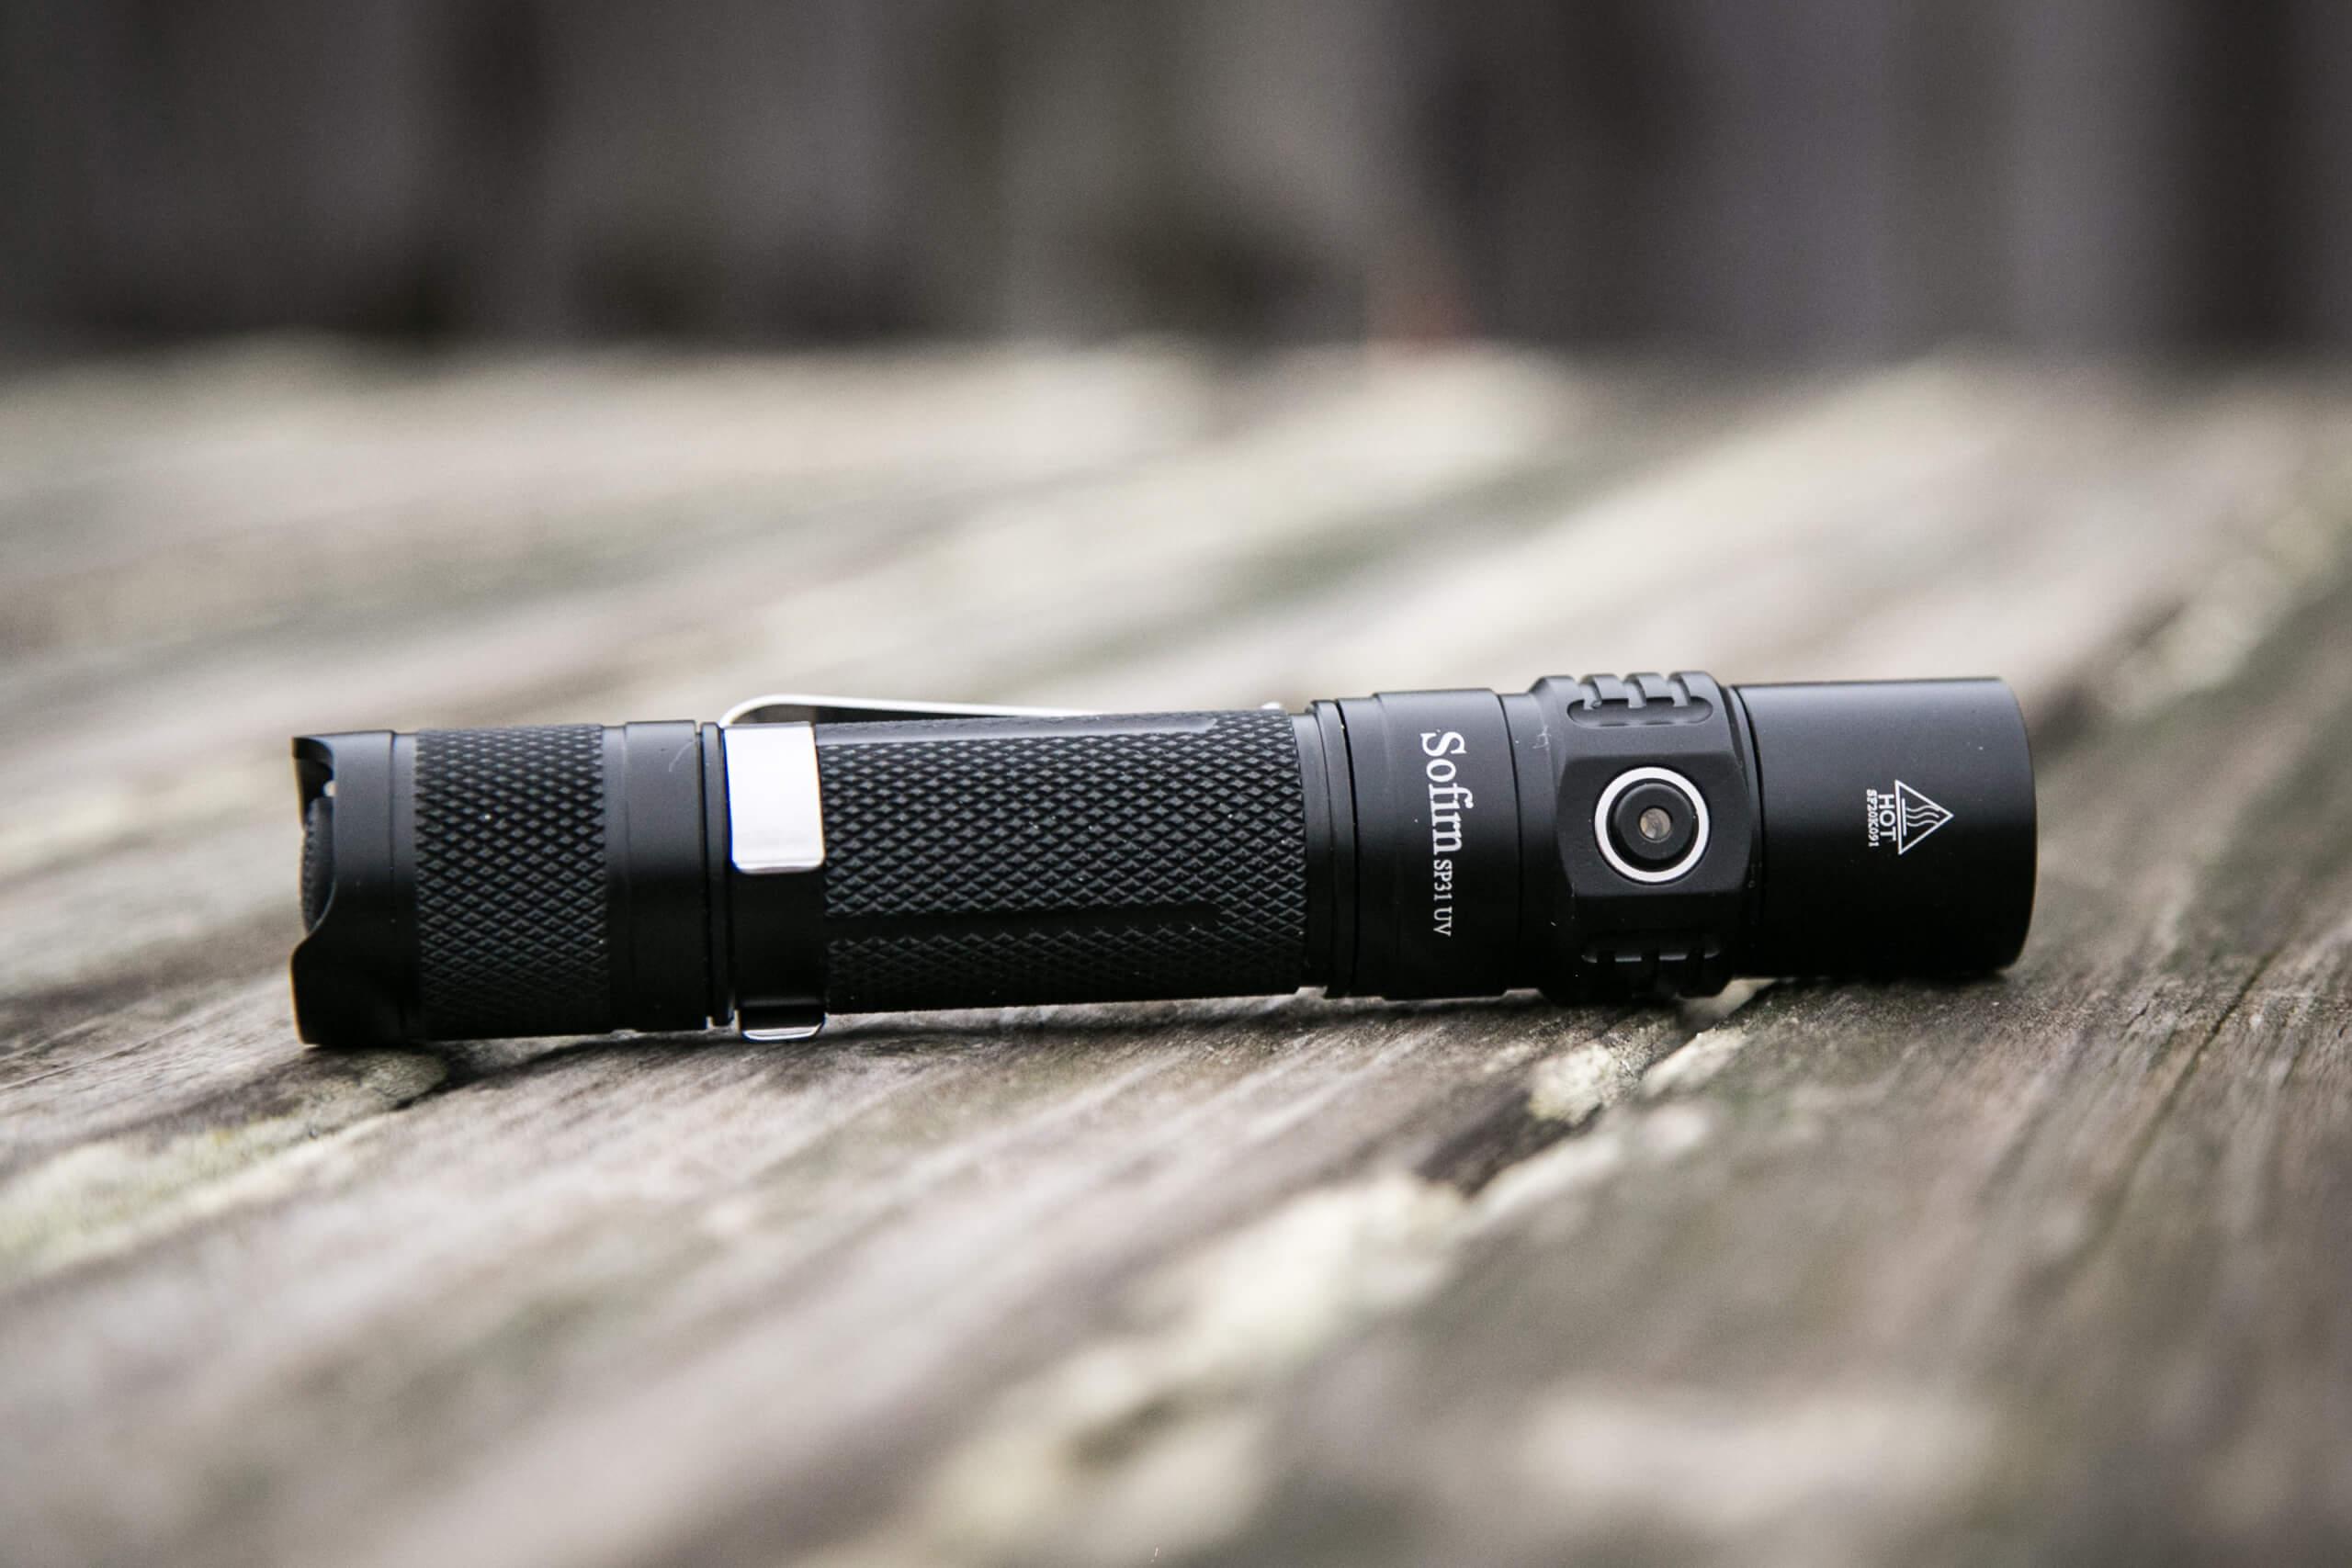 sofirn sp31uv ultraviolet 18650 flashlight feature photo